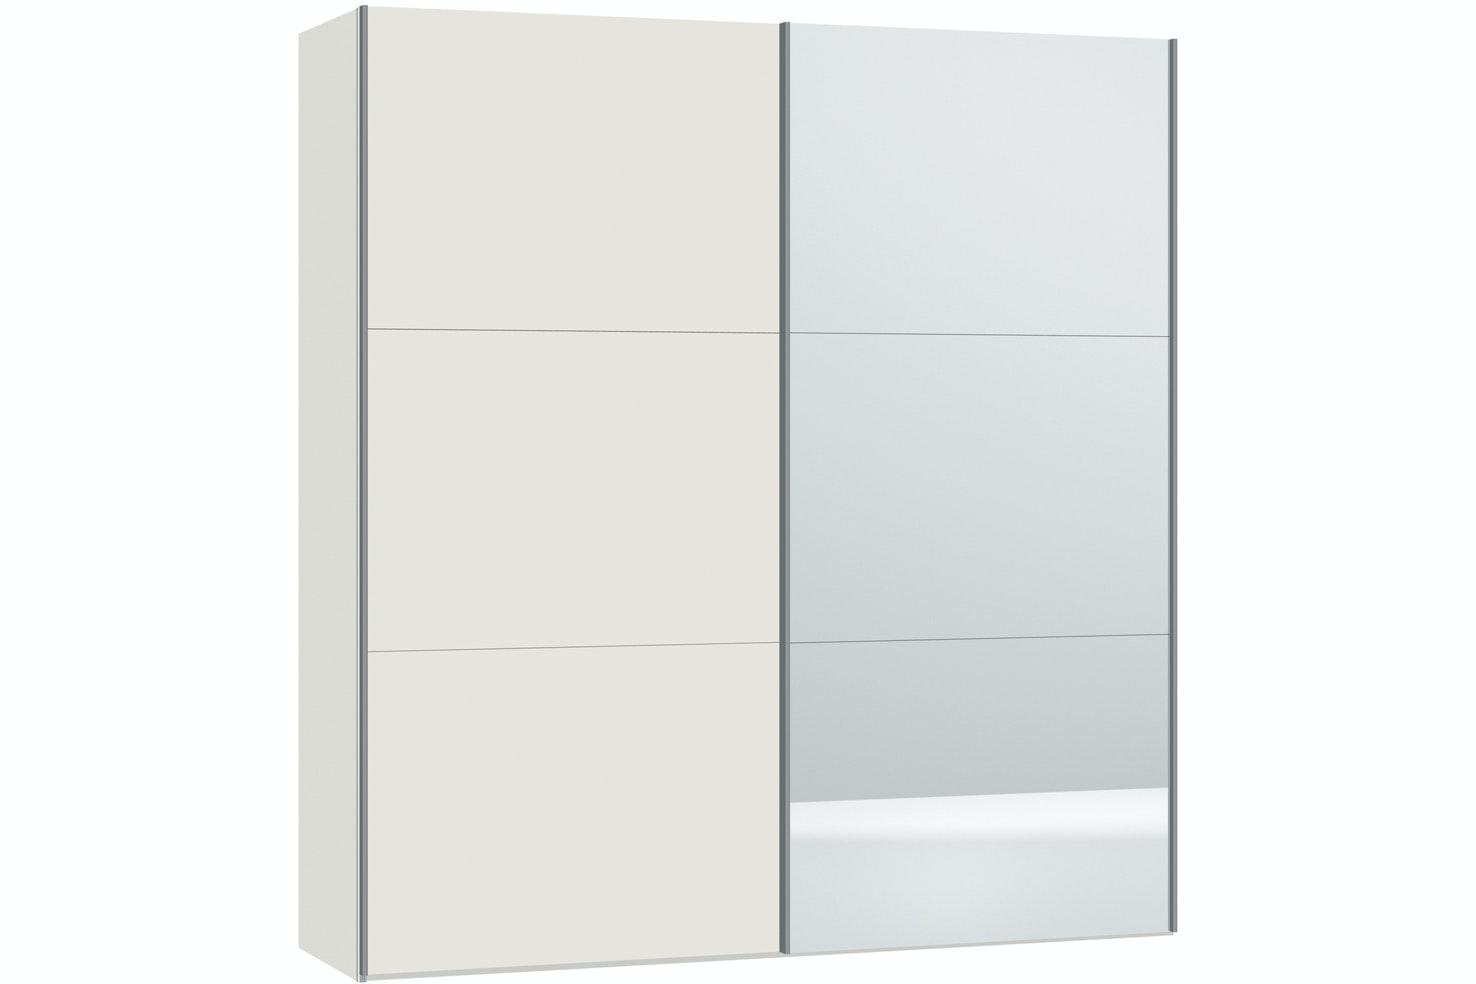 Emer Sliding Wardrobe 203Cm | White+Mirror